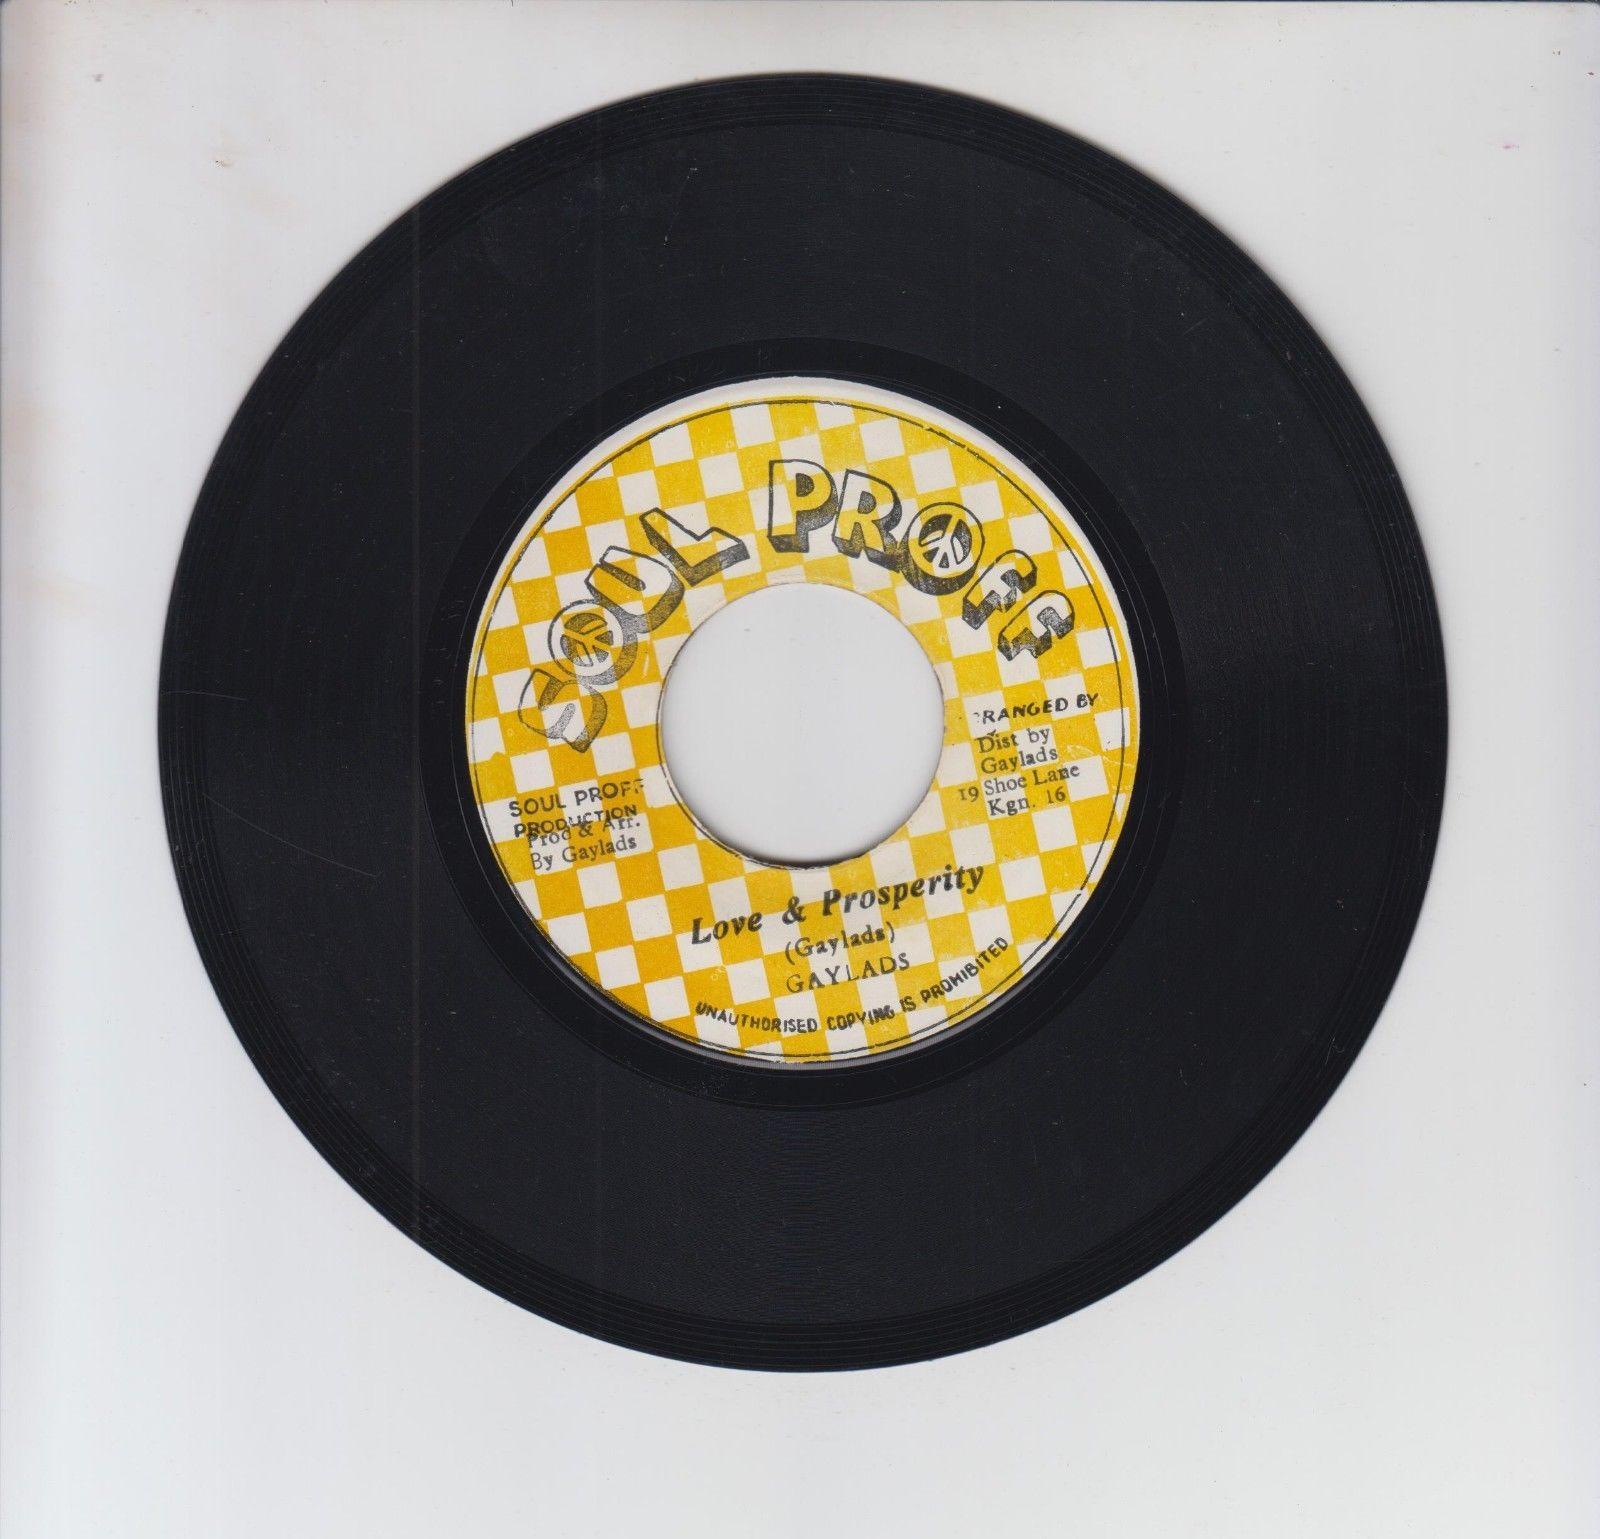 "SOUL PROFF/ LOVE & PROSPERITY - GAYLADS  (70'S REGGAE ROOTS 7"")"